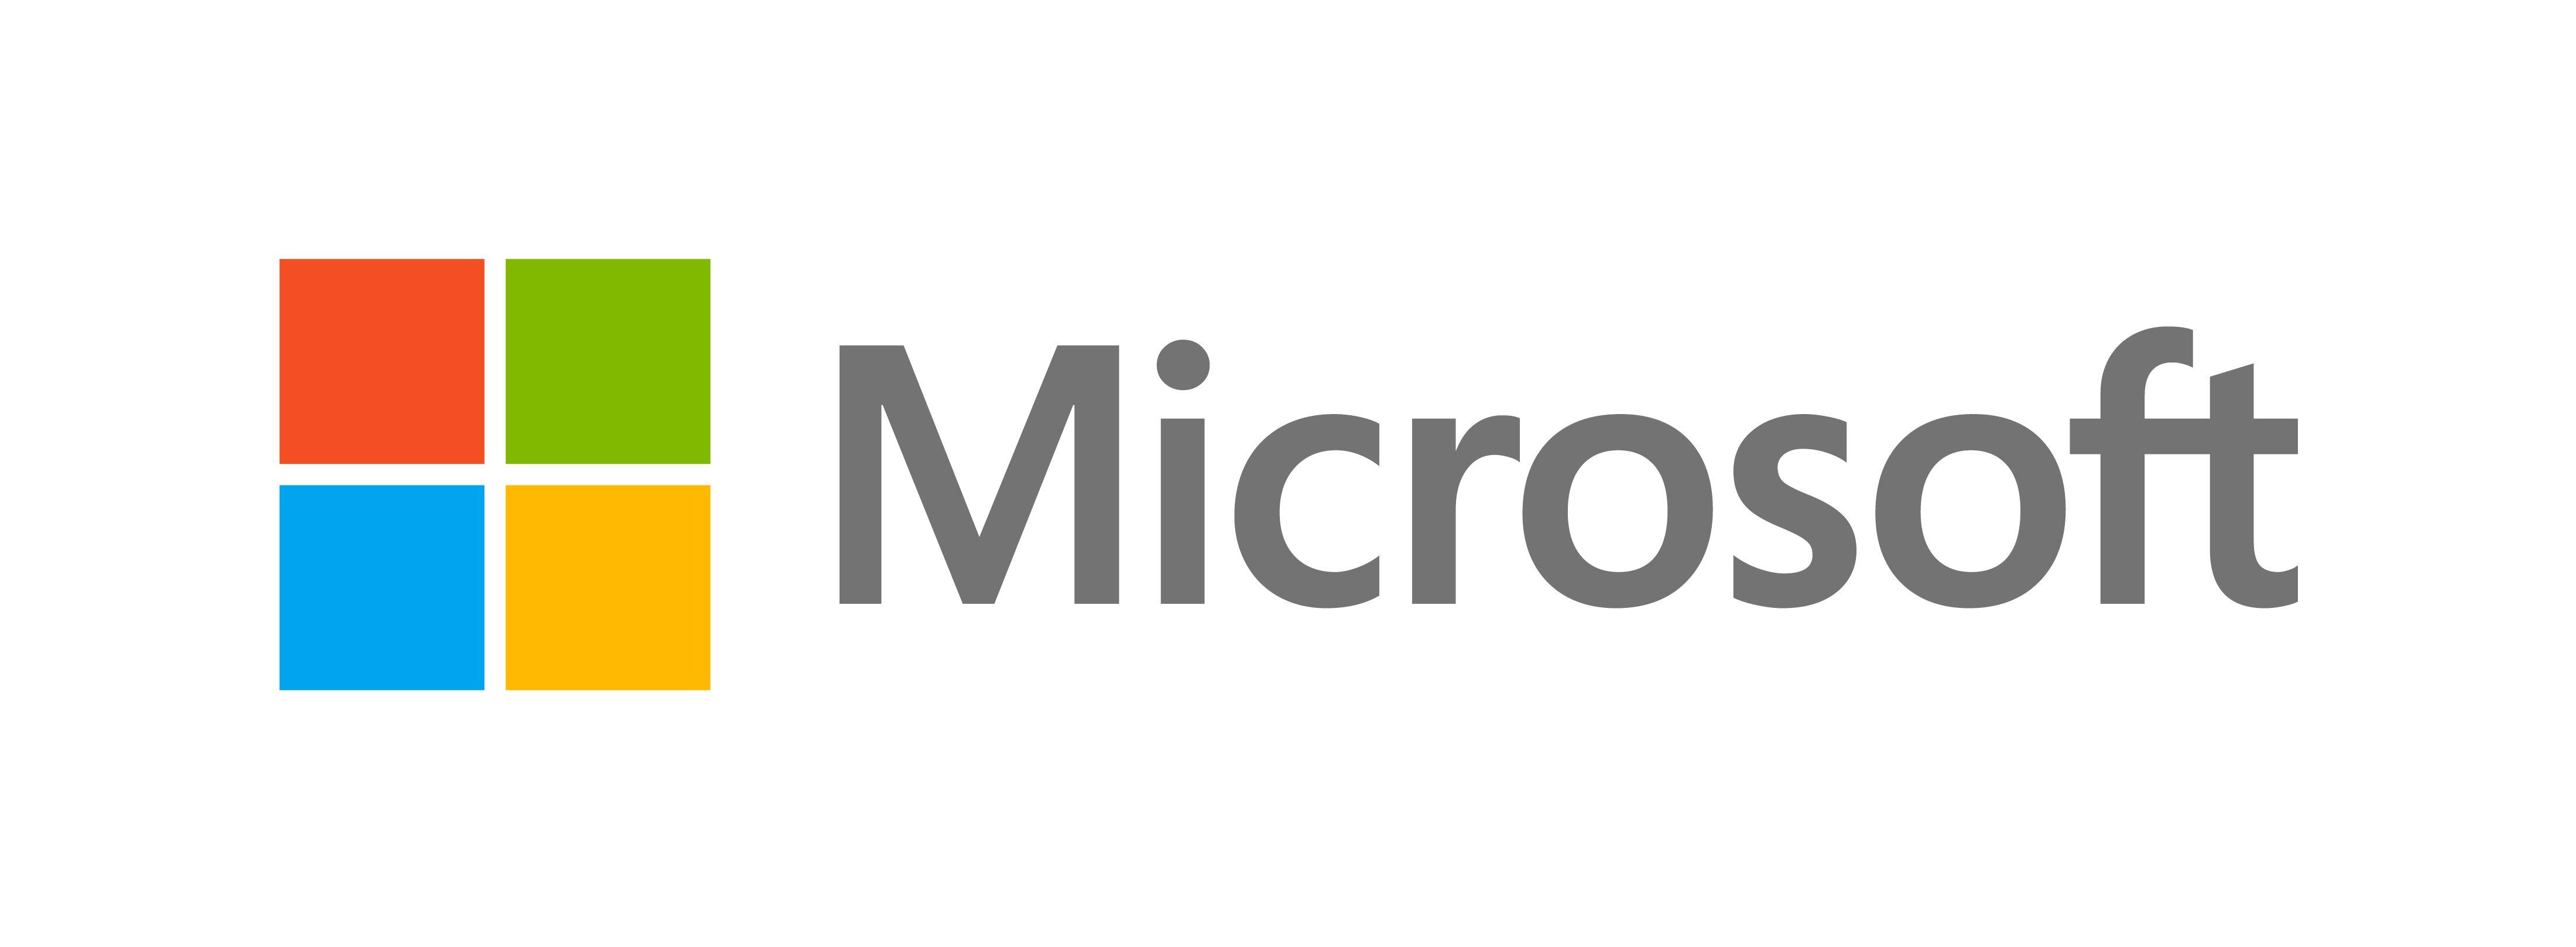 Microsoft Store xbox.com free $4 code via email. Definite YMMV